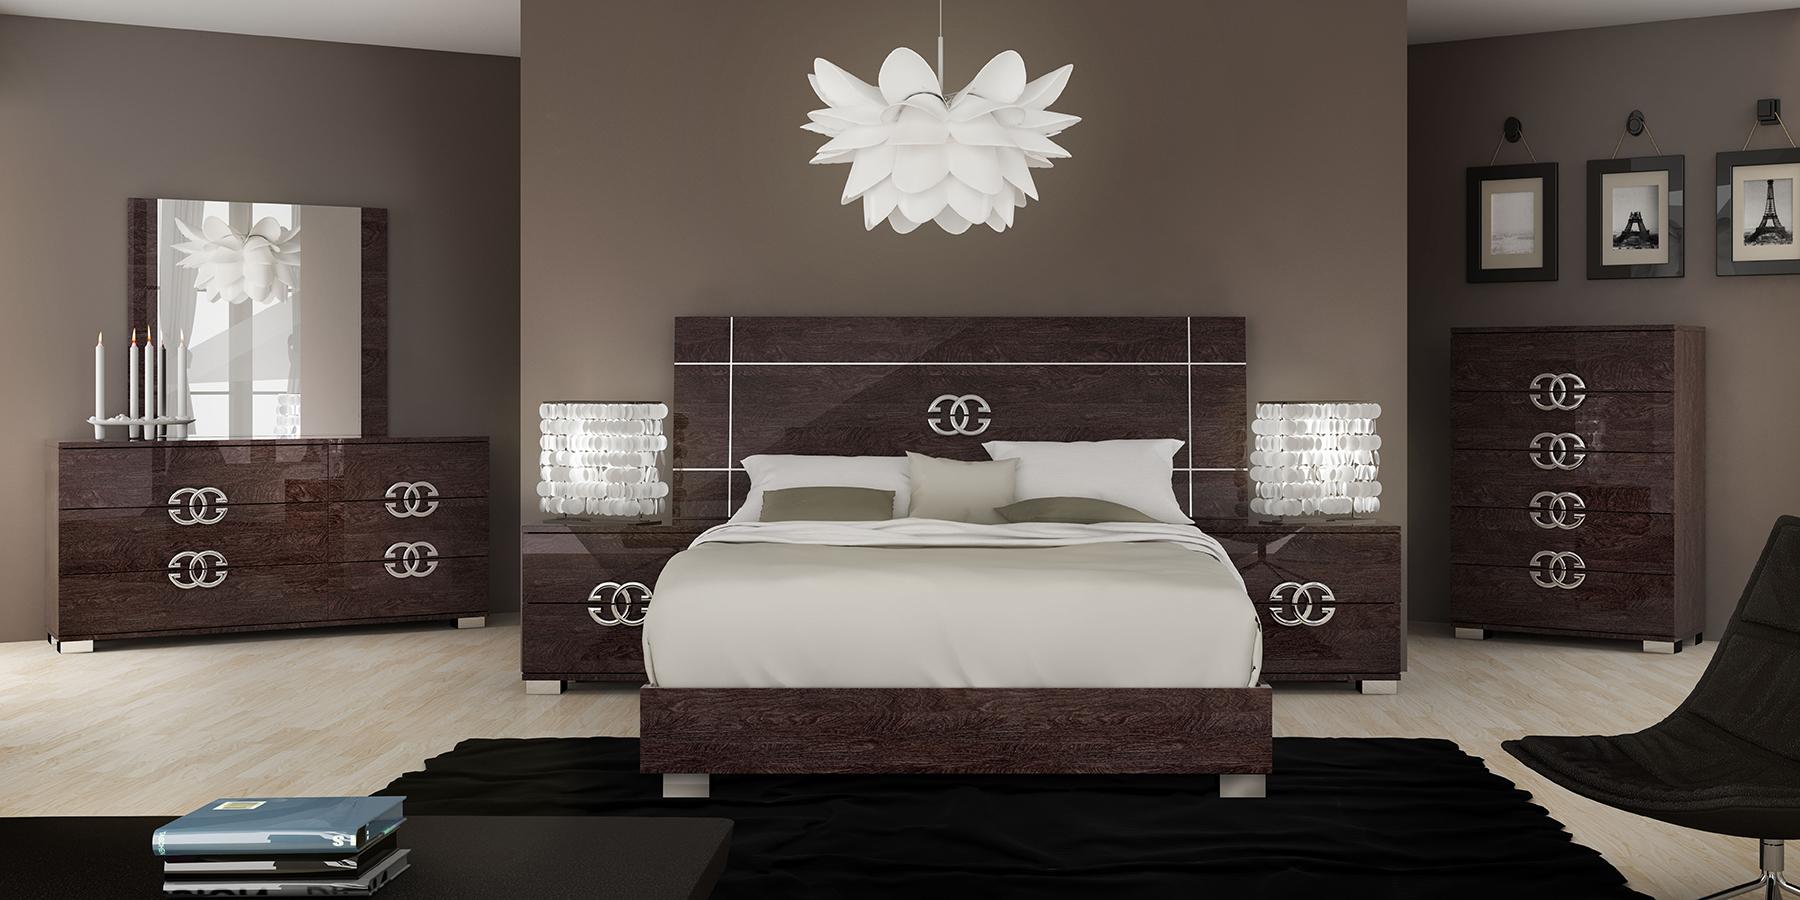 italian bedroom furniture modern. Prestige Nightstand Italian Bedroom Furniture Modern C